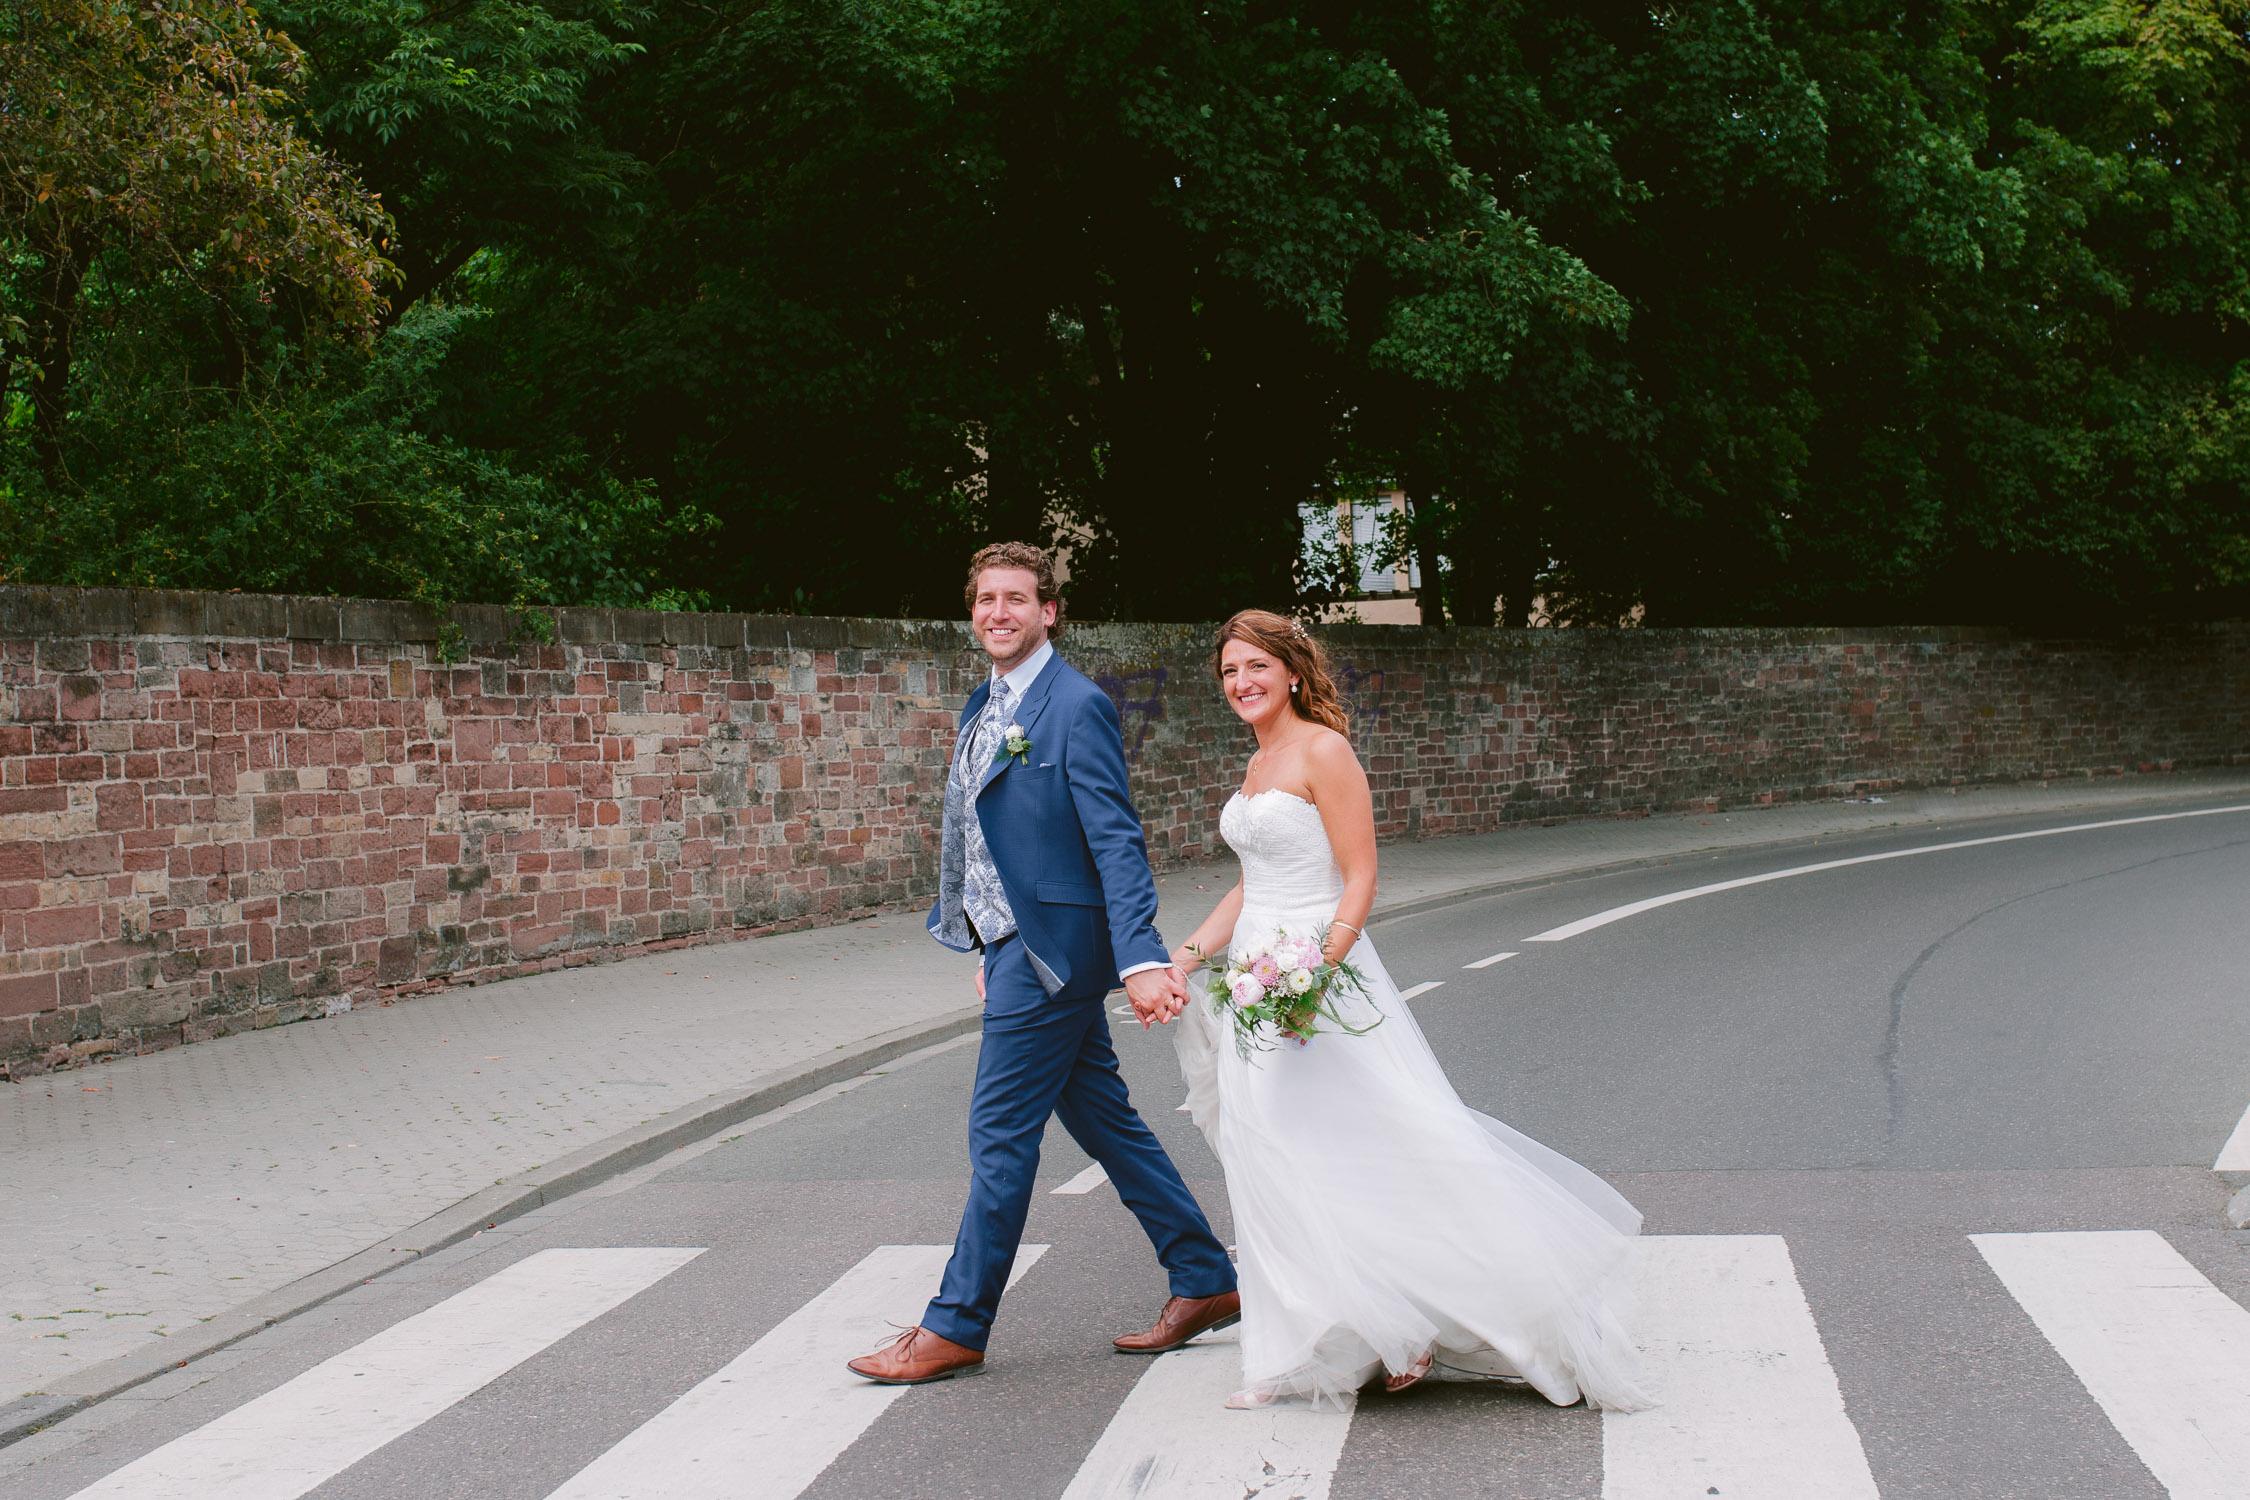 Brautpaar geht wie Beatles über den Zebrastreifen